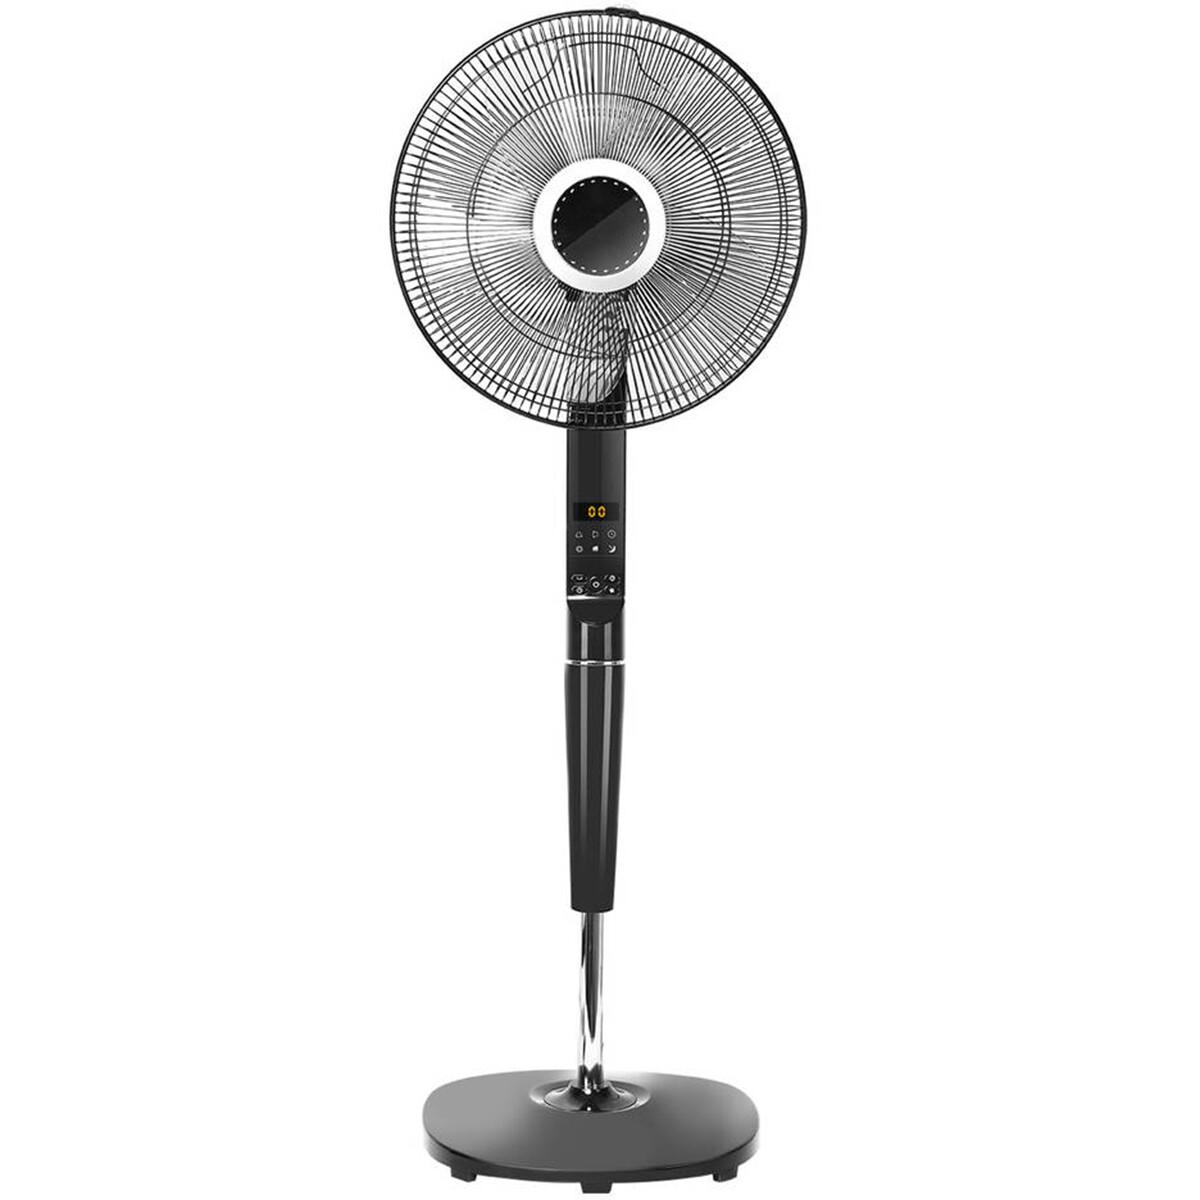 Ventilator - Aigi Lanim - Statiefventilator - Staand - Rond - Mat Zwart - Kunststof